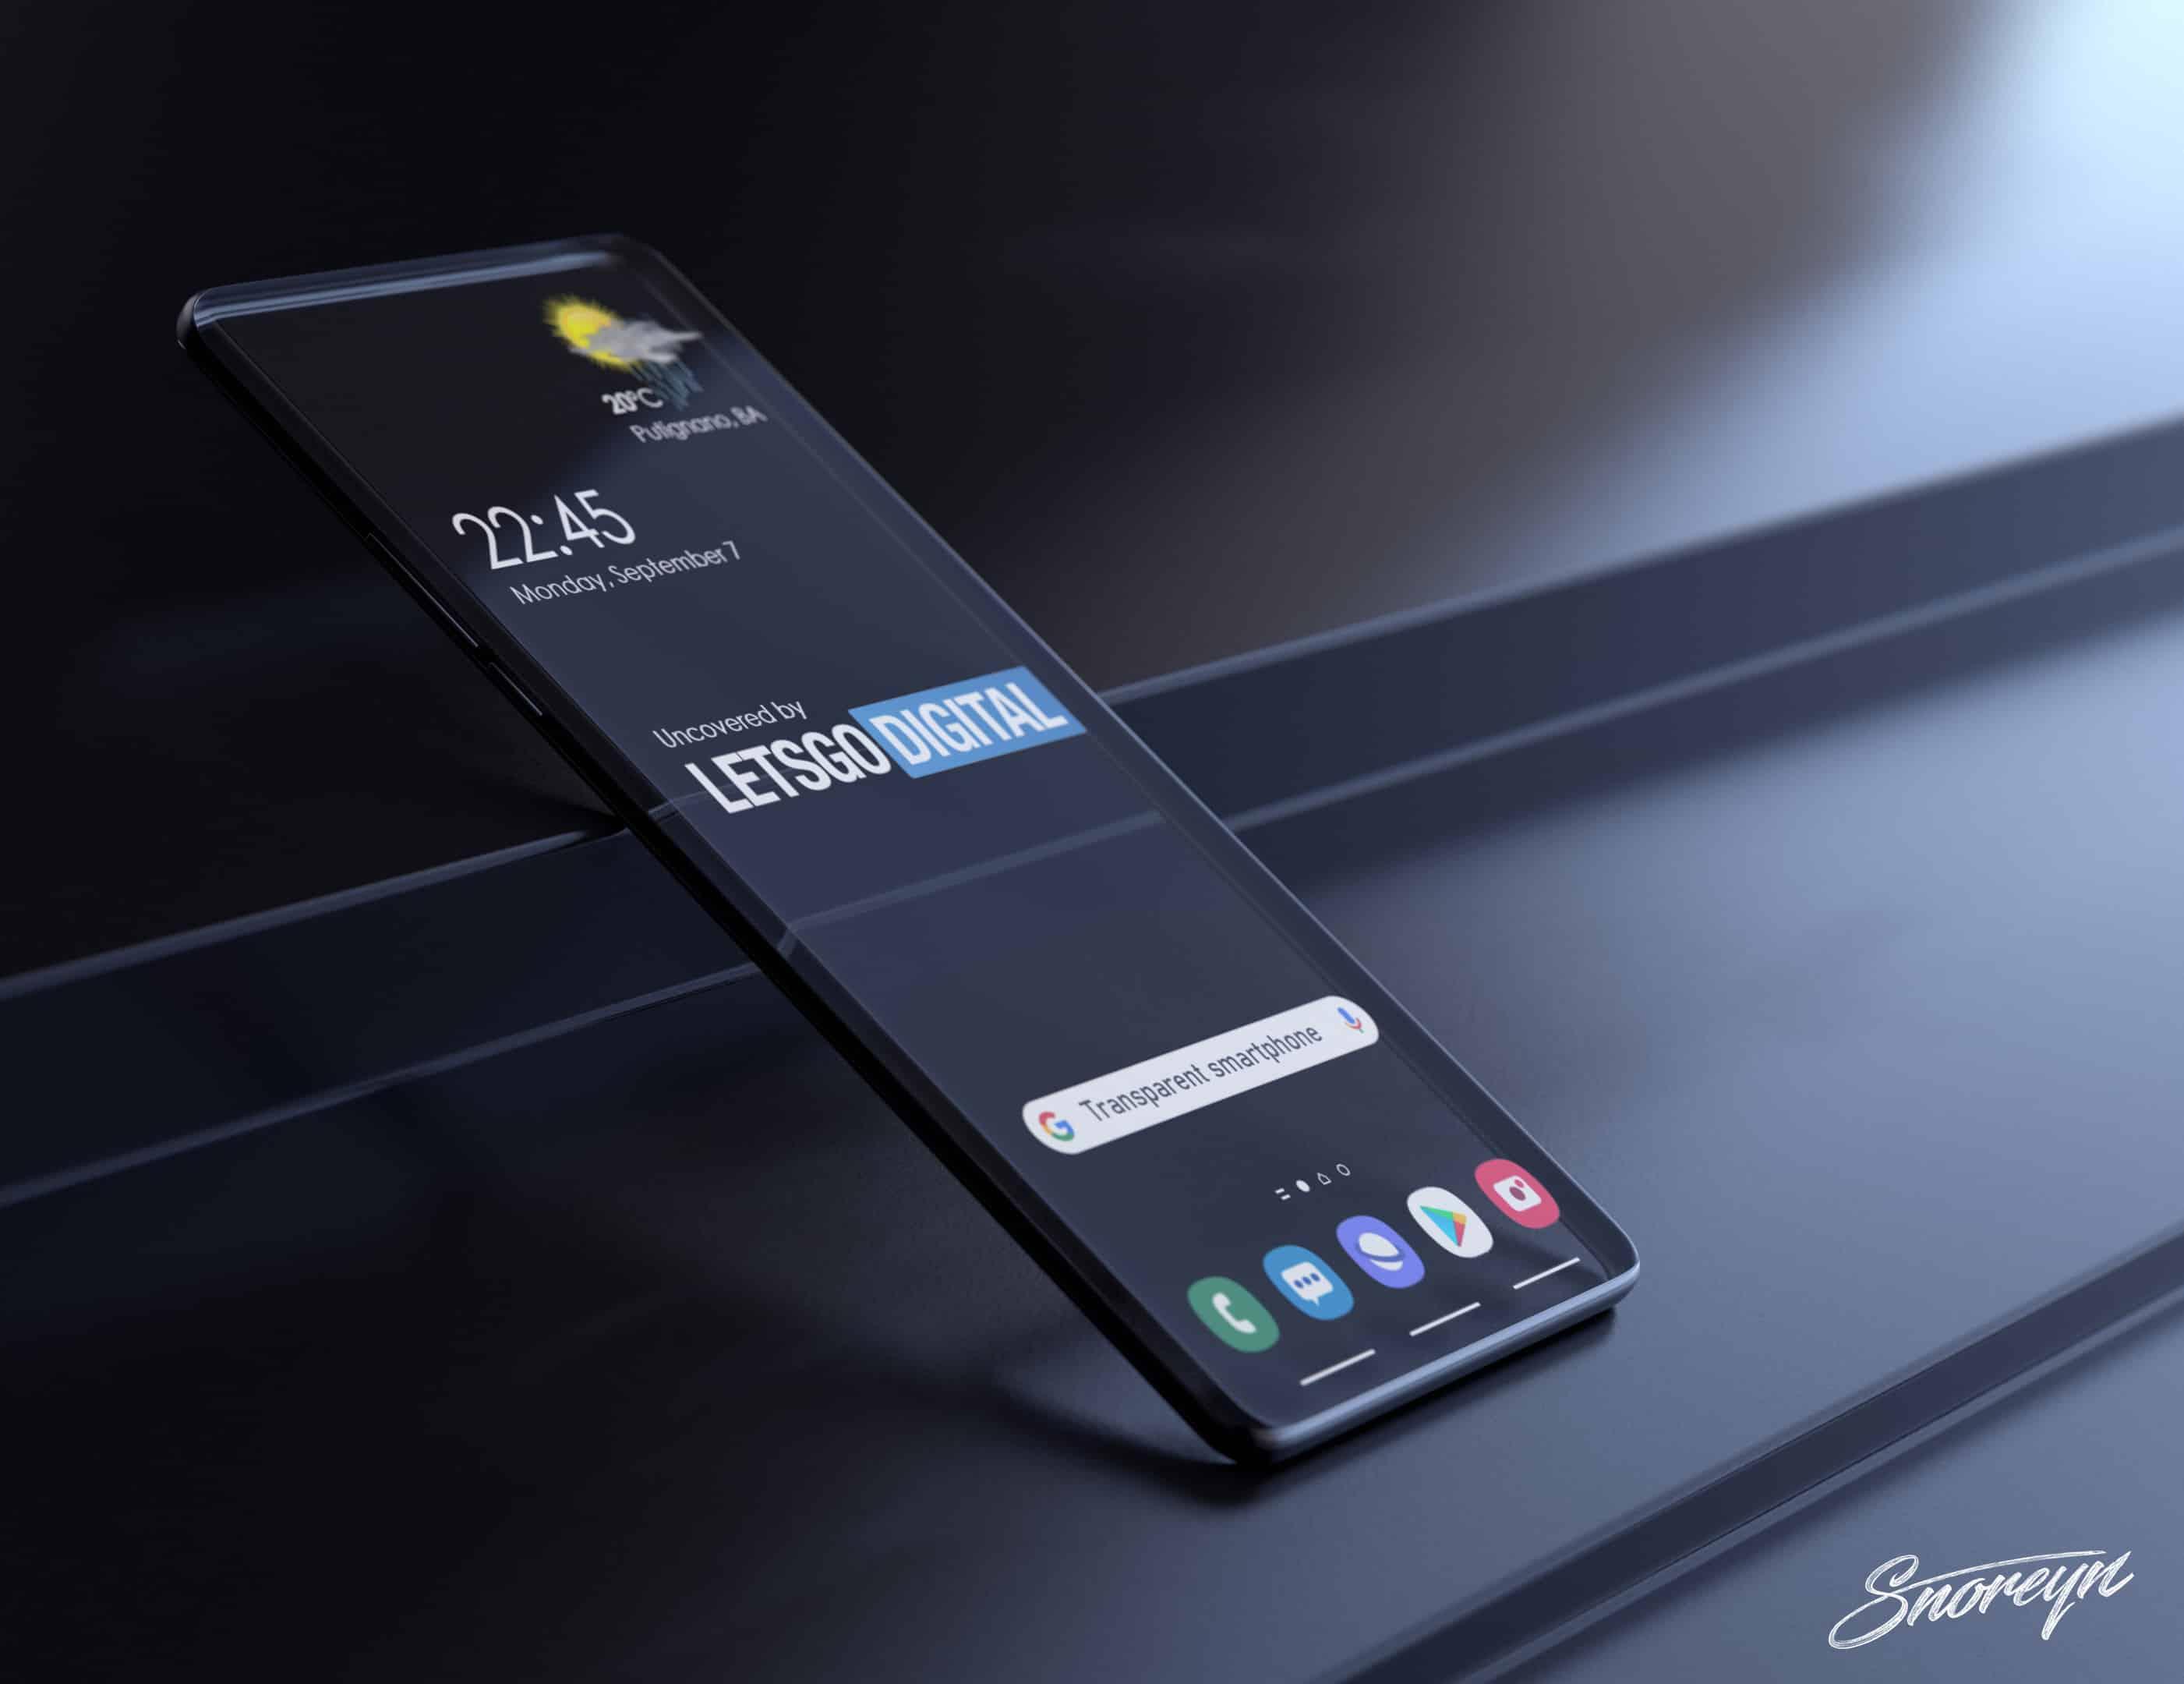 Samsung transparent smartphone Letsgodigital image 5